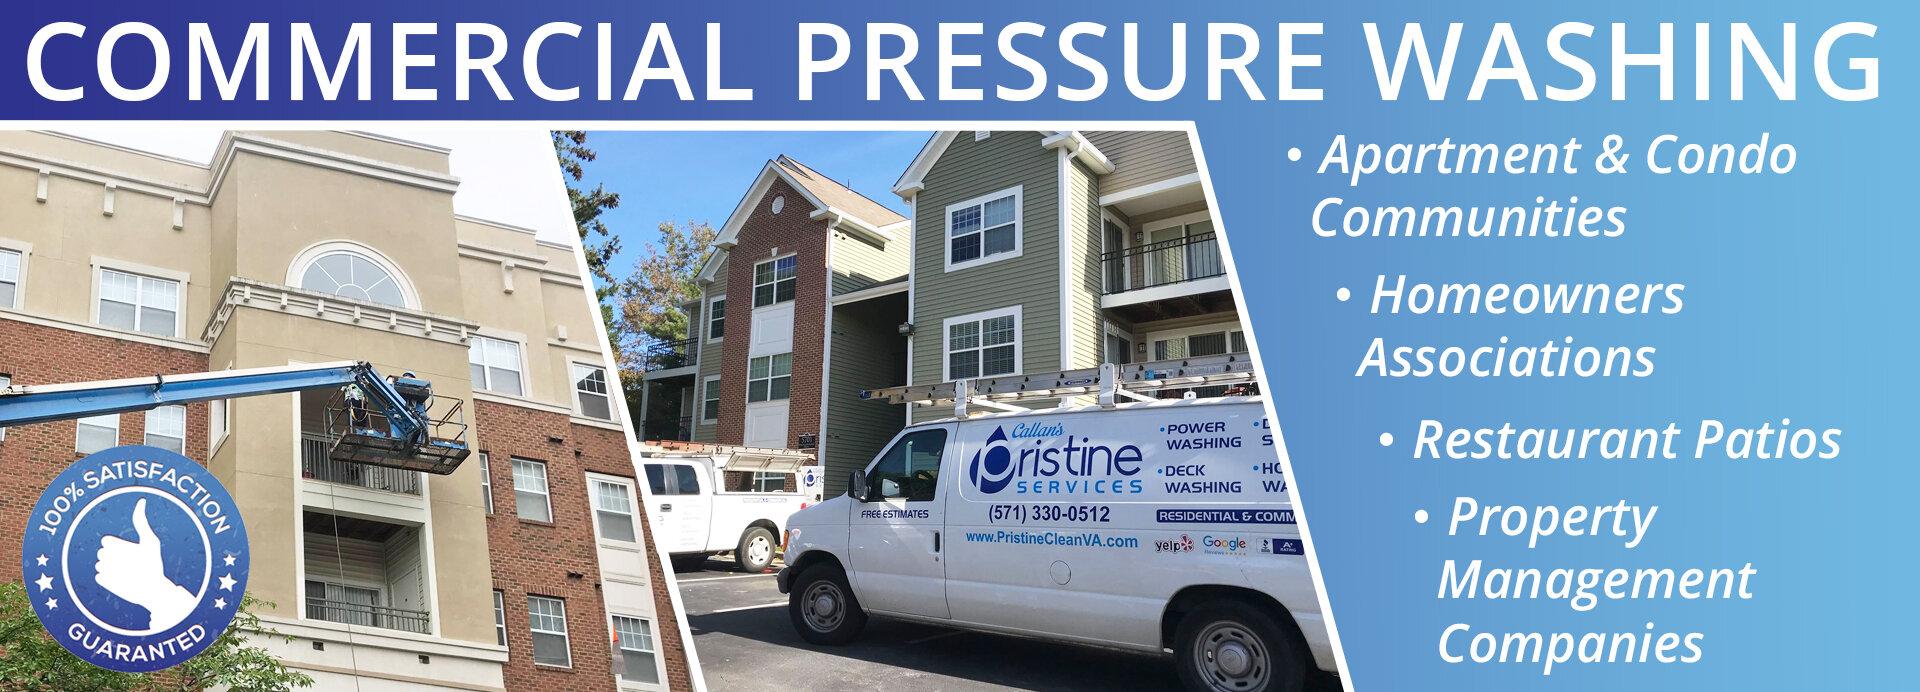 Commercial Pressure Washing Callan S Pristine Services